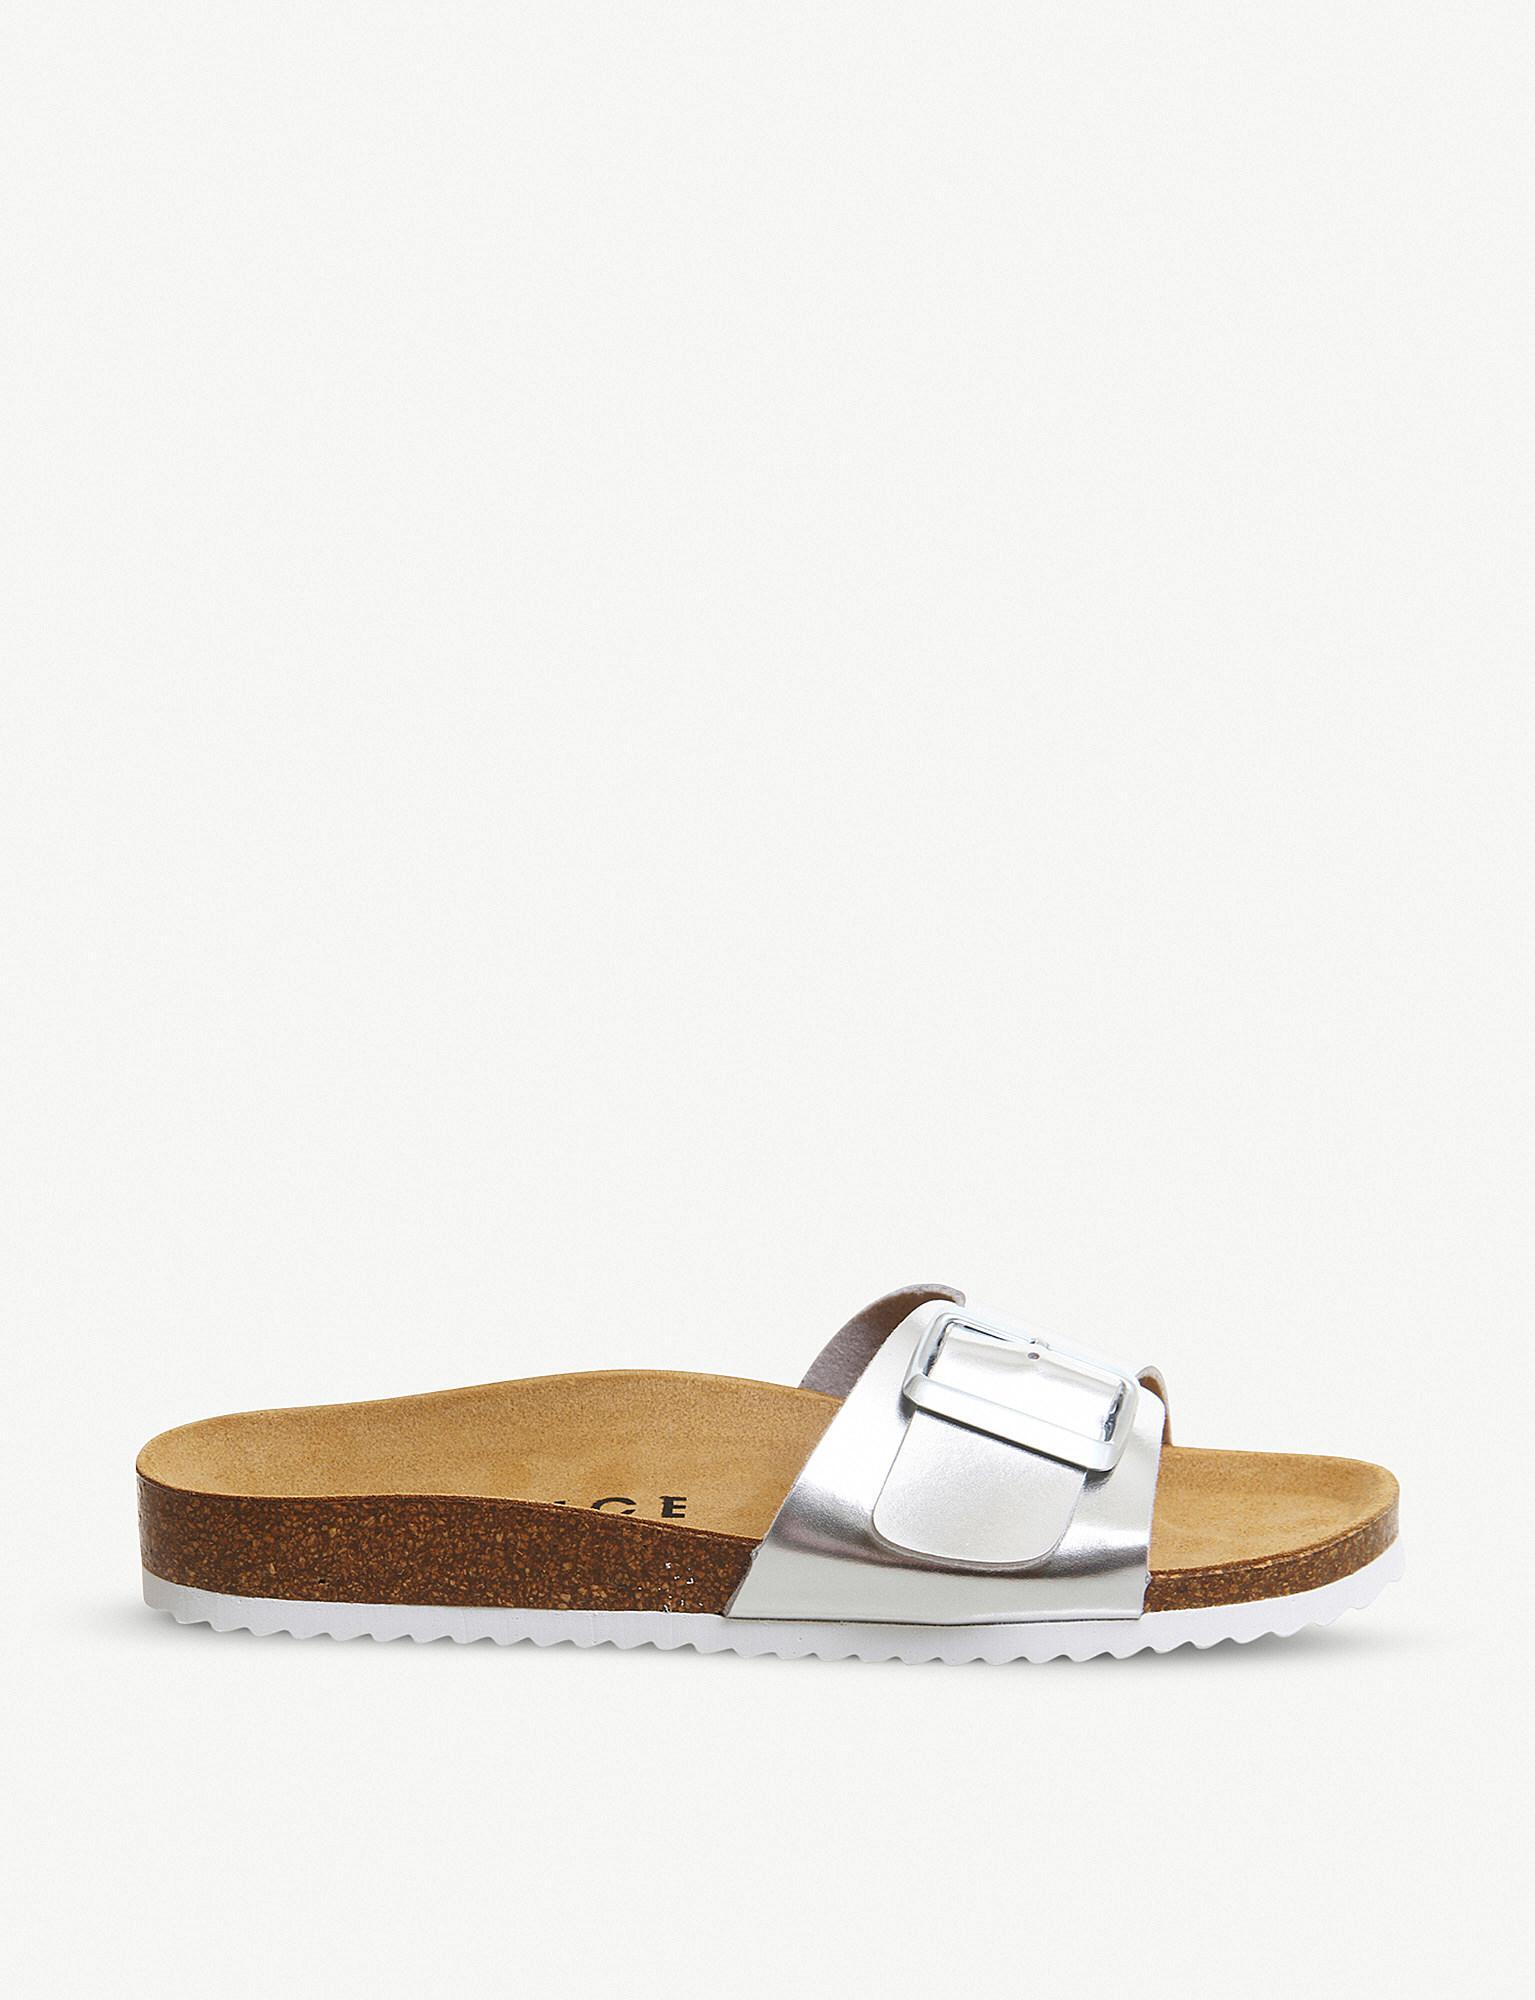 86856fd0cd8d Office Sleek Big Buckle Footbed Metallic Sandals in Metallic - Lyst